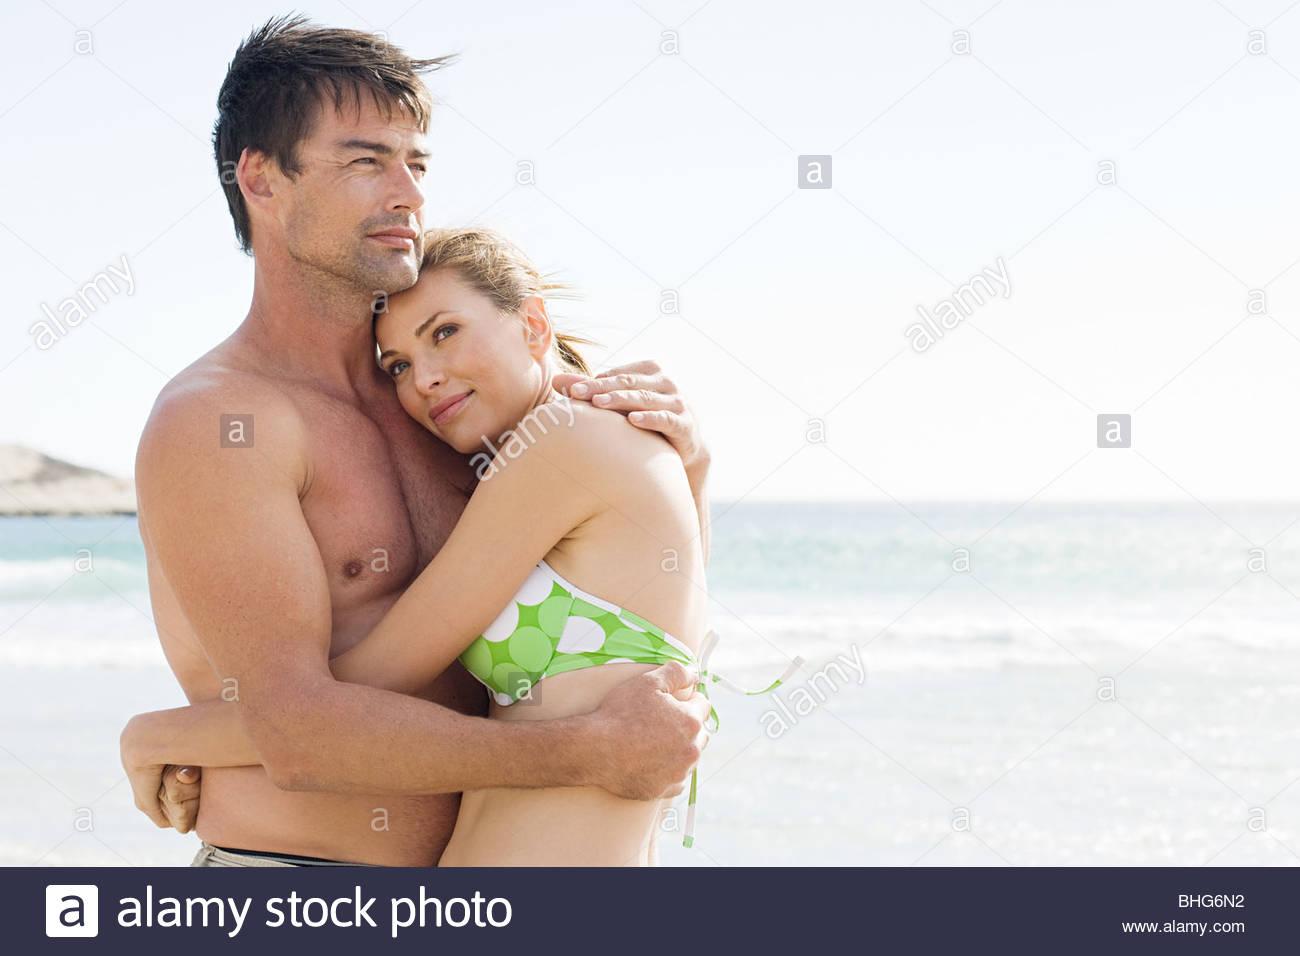 Couple in swimwear embracing on the beach - Stock Image